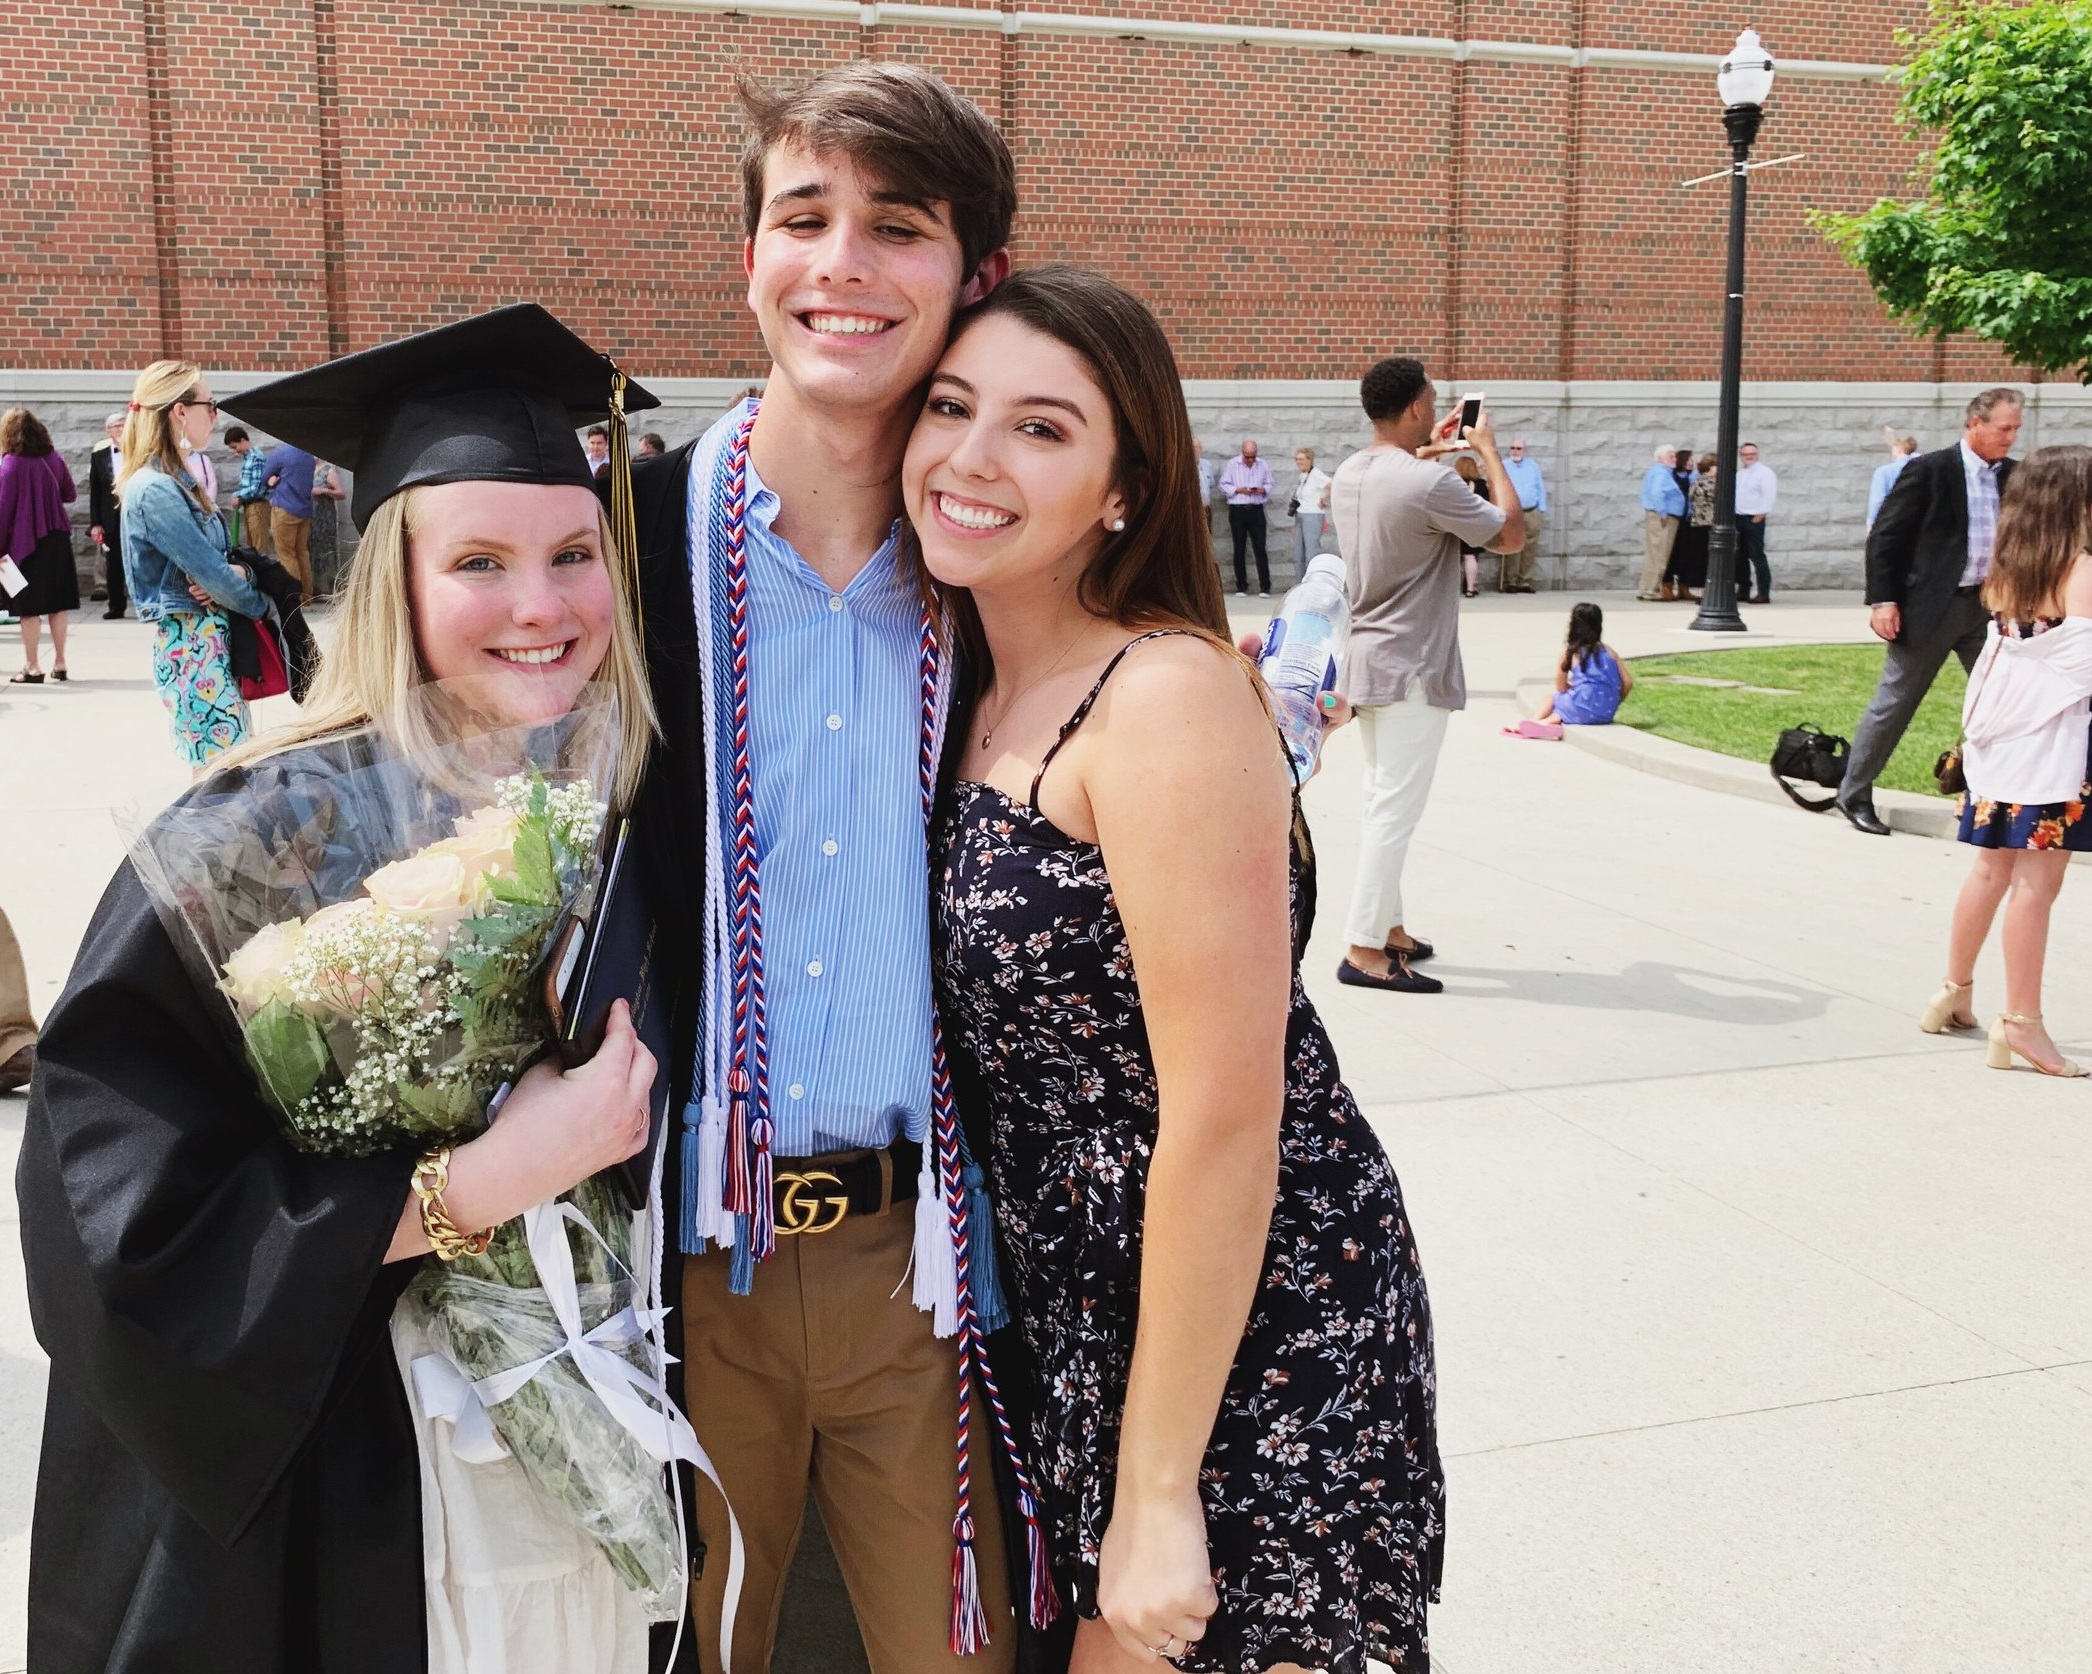 8th grade besties at graduation